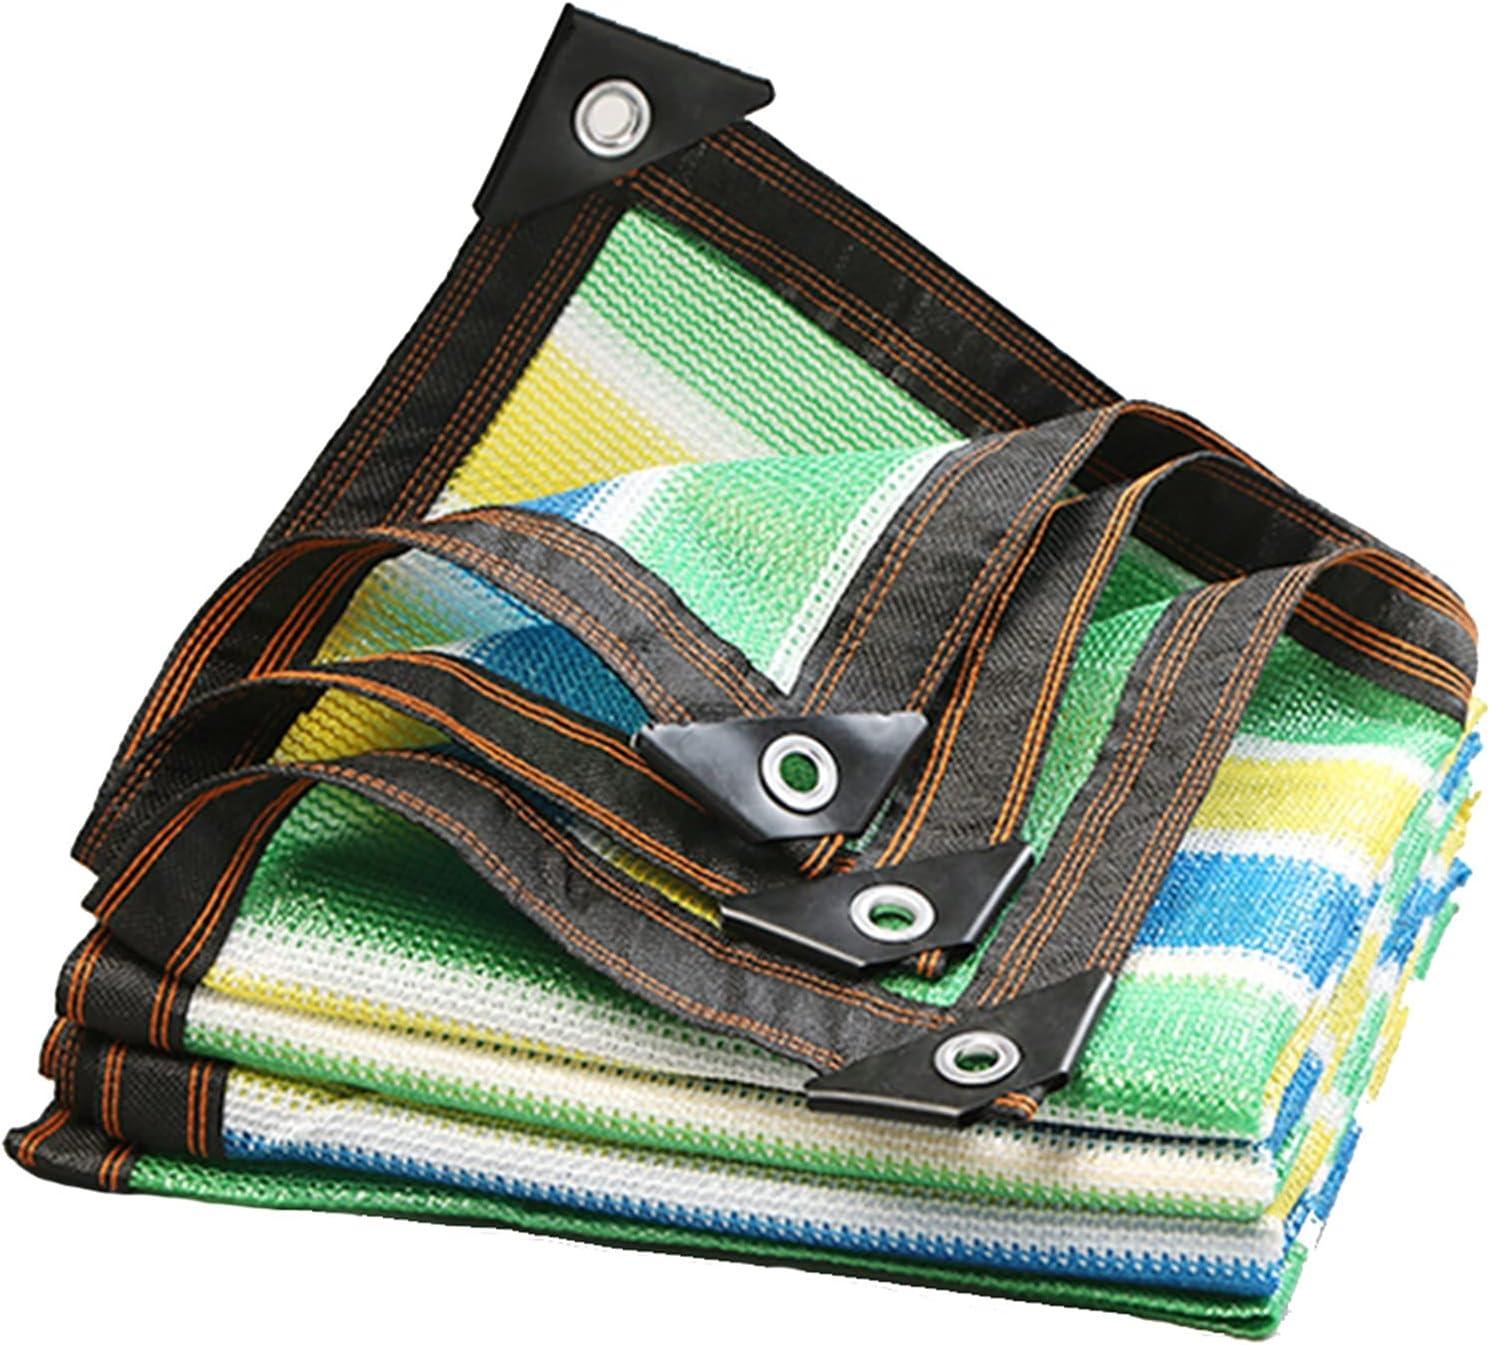 WZHIJUN Sunblock Shade Cloth store 85% Greenhou Garden Industry No. 1 Outdoor Anti-UV